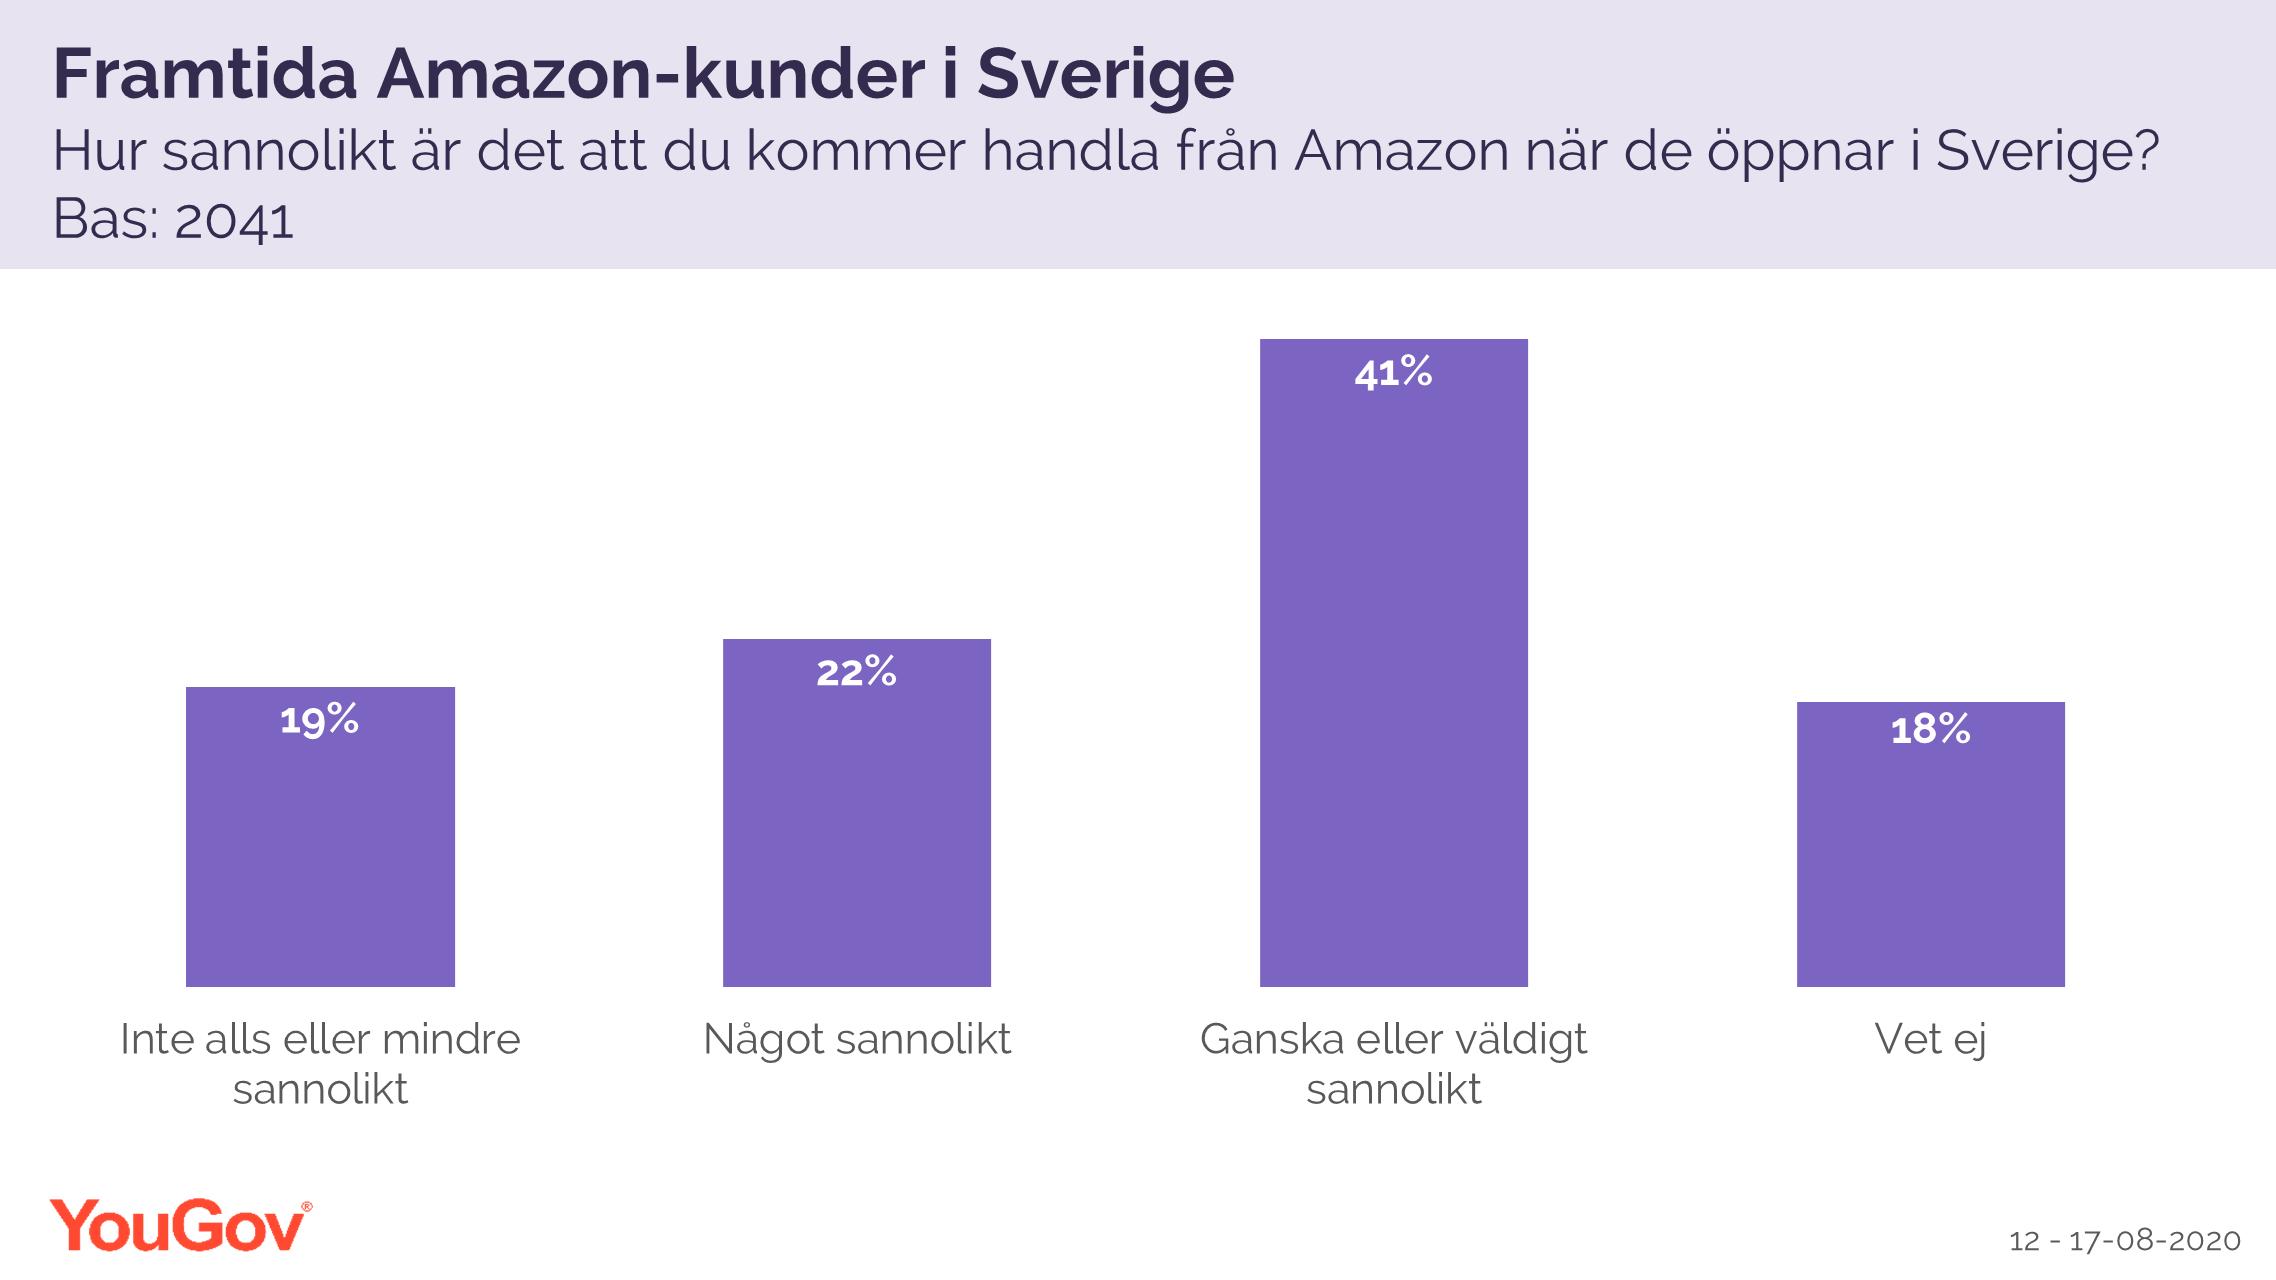 Framtida Amazon-kunder